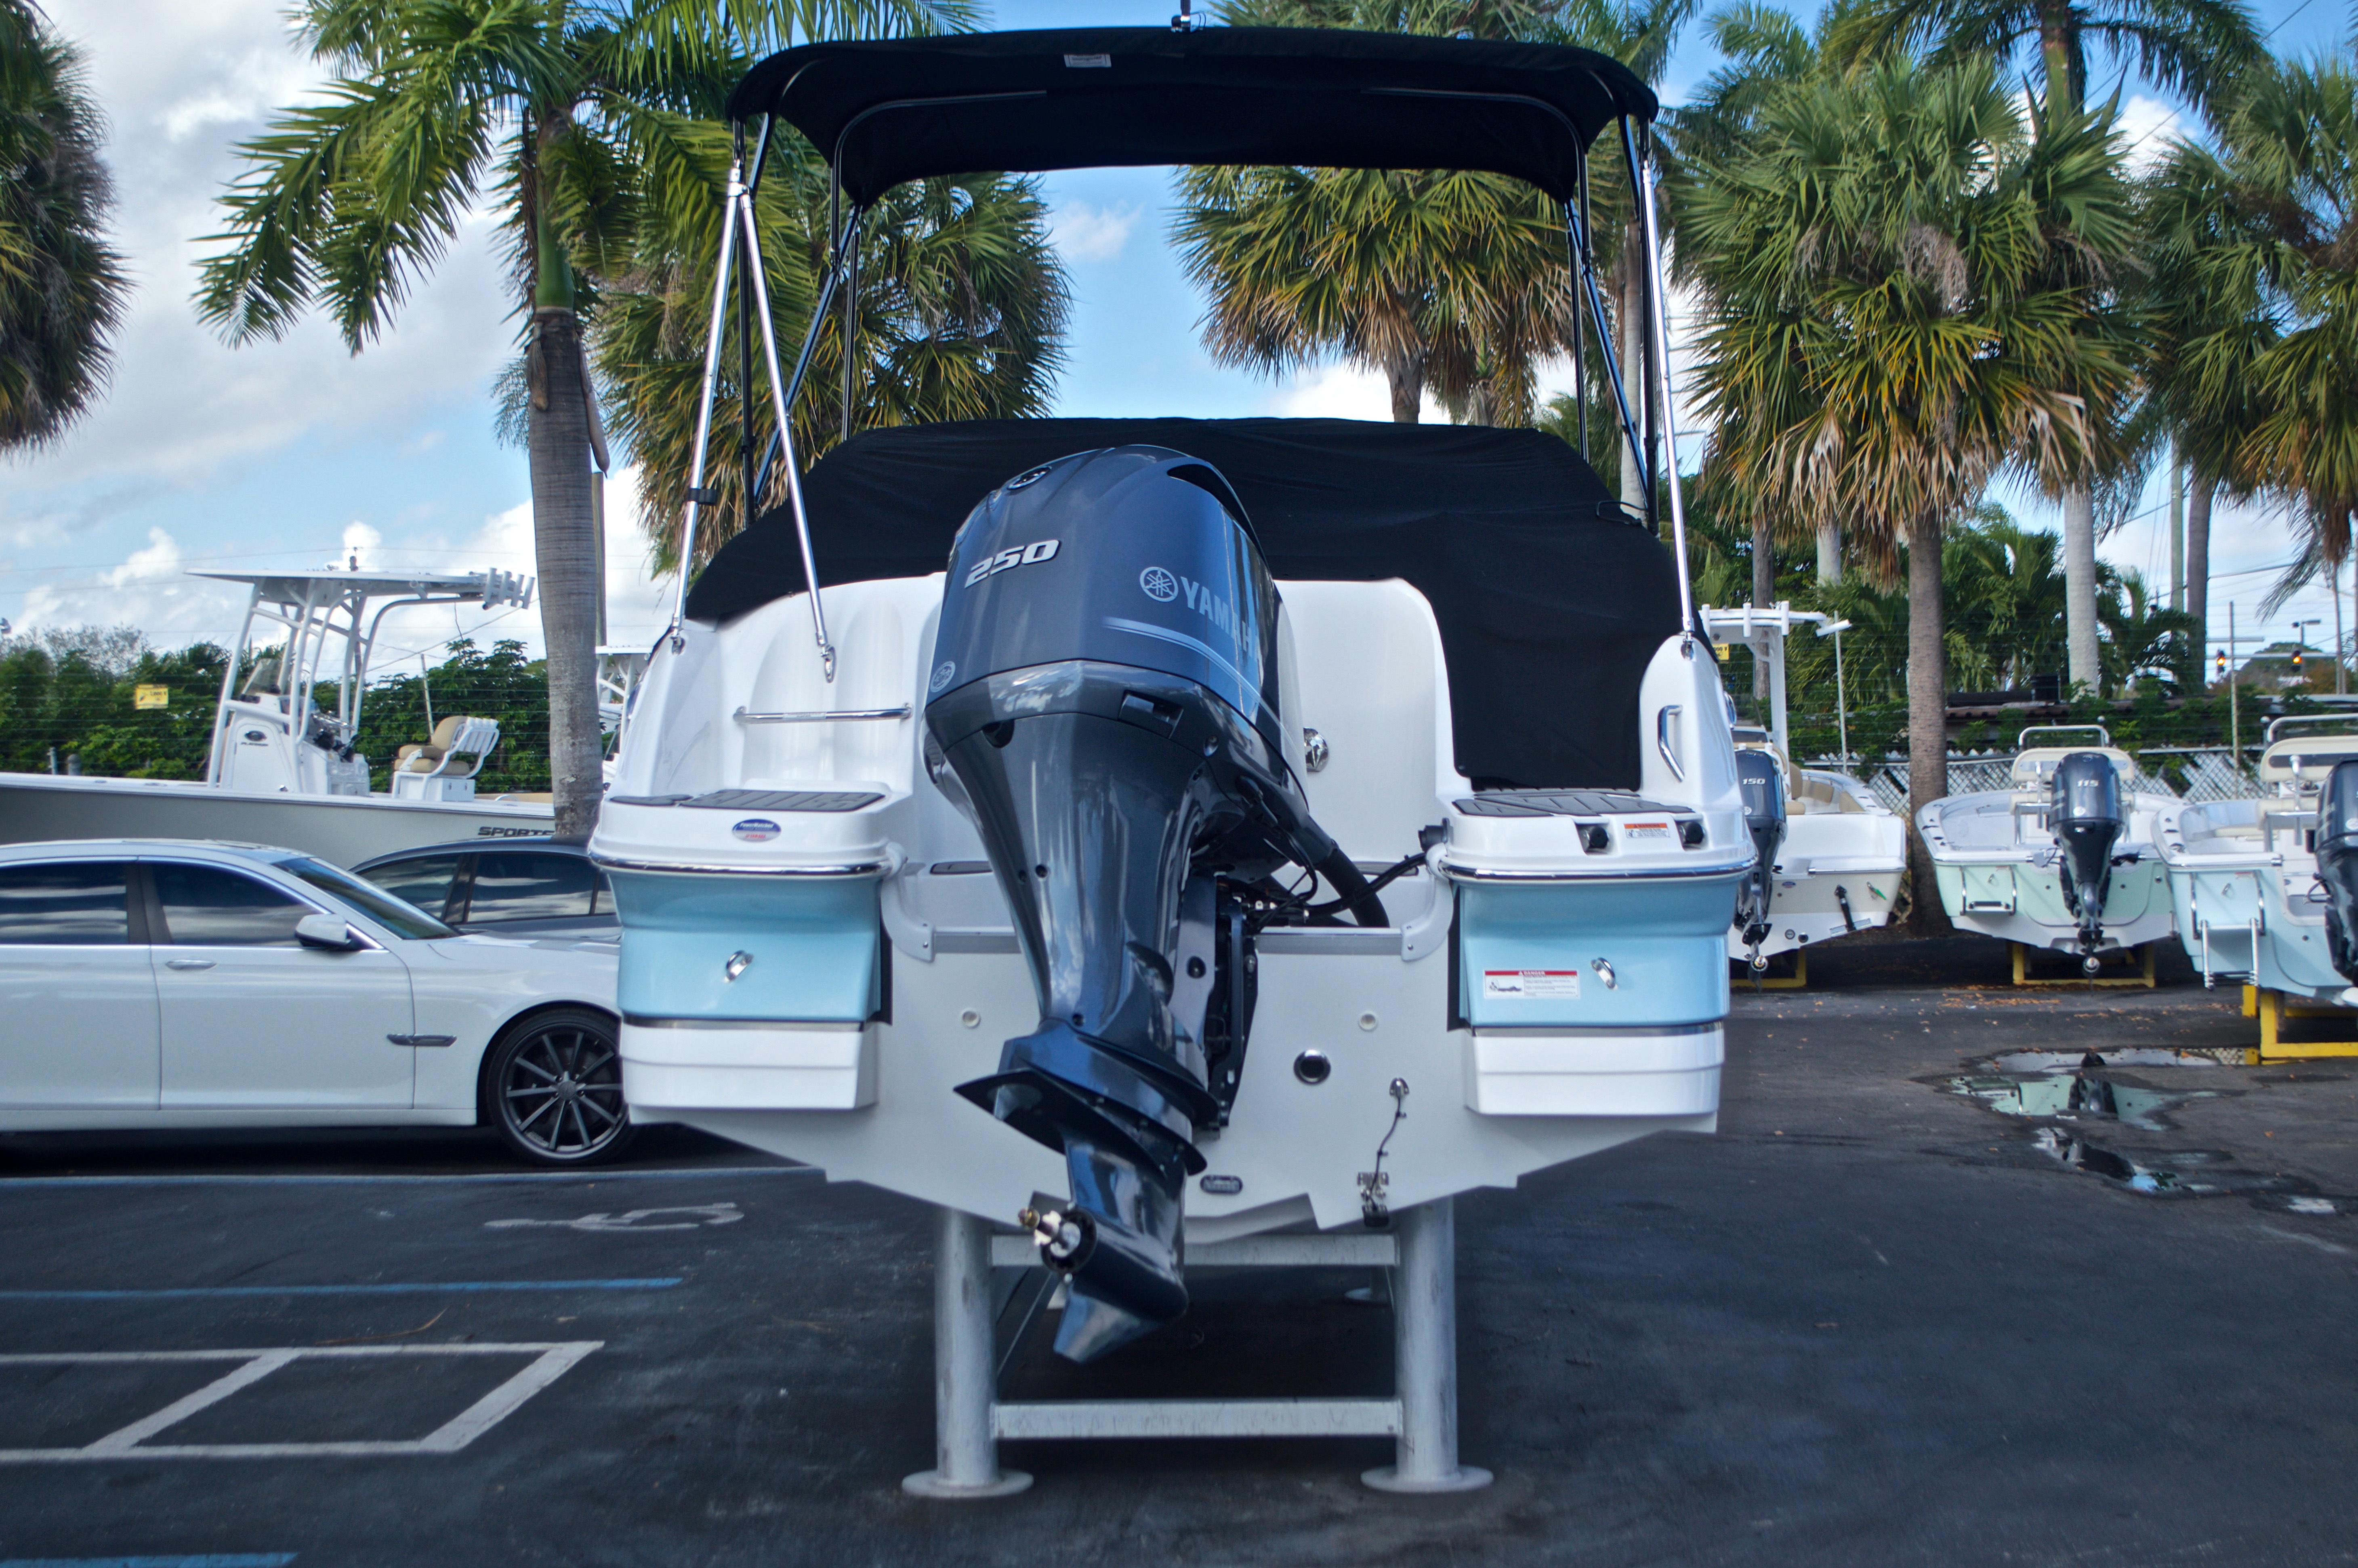 Thumbnail 13 for New 2017 Hurricane SunDeck SD 2400 OB boat for sale in Miami, FL